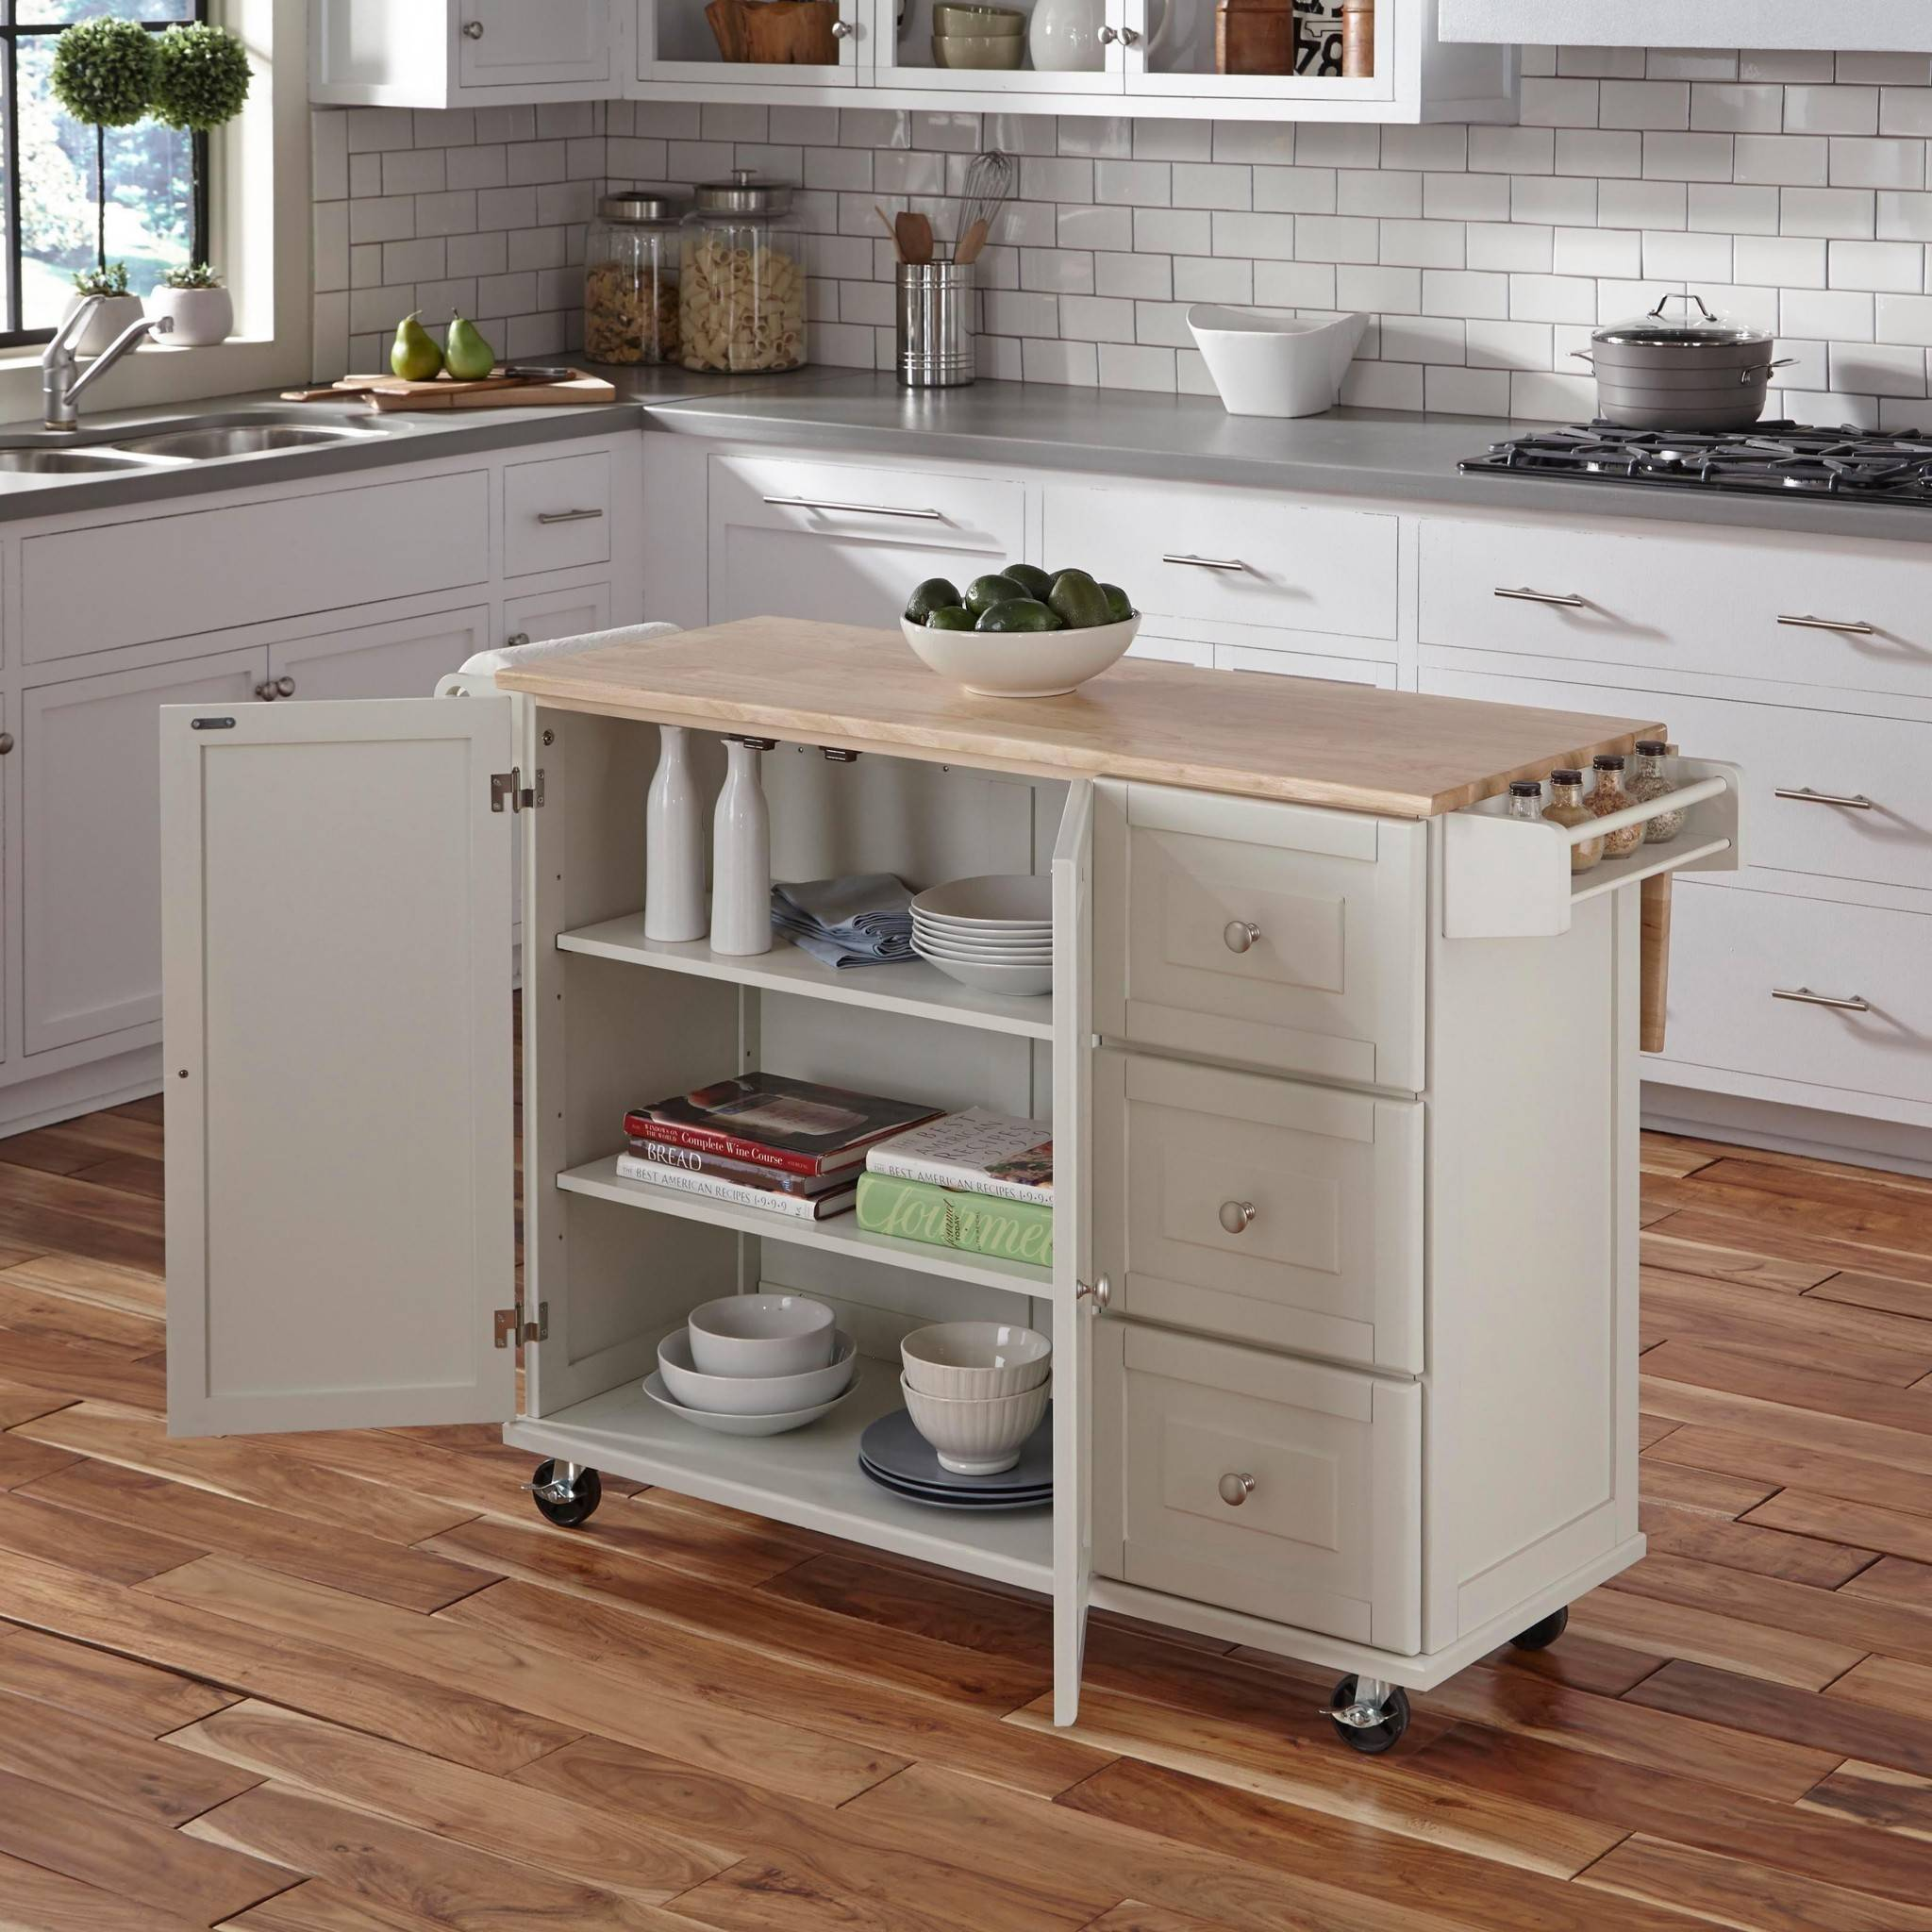 kitchen island on wheels with open cupboard doors